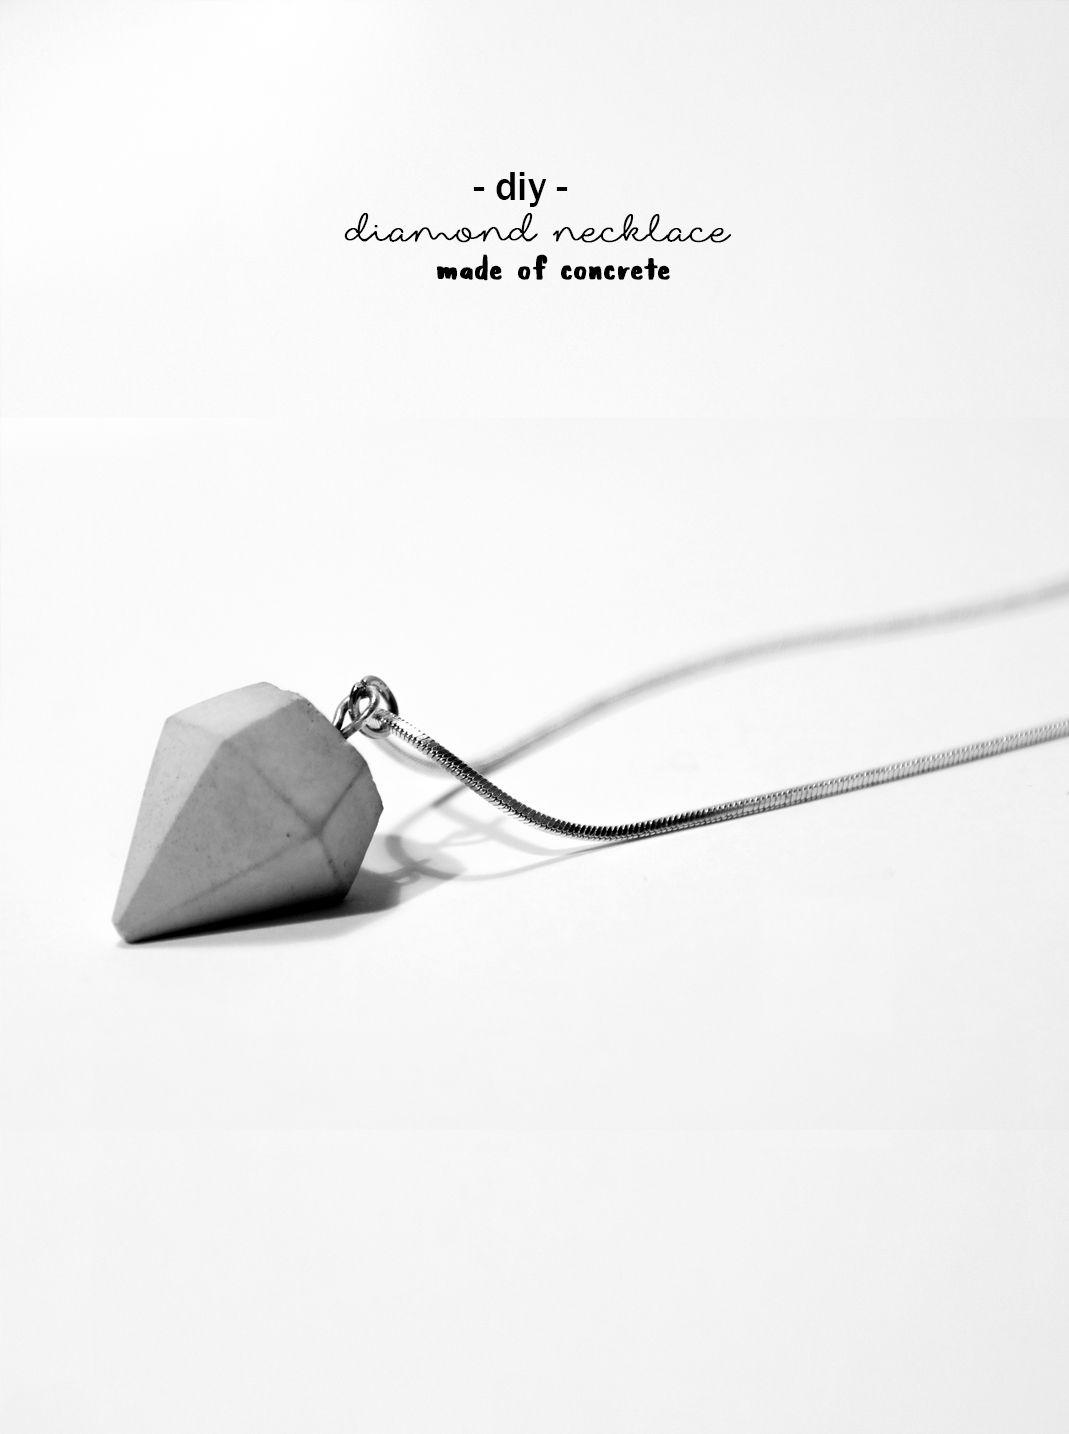 Beton diamant kette diy concrete necklace tutorial and tutorials beton diamant kette concrete designdiy concretediamond necklaceschain solutioingenieria Gallery